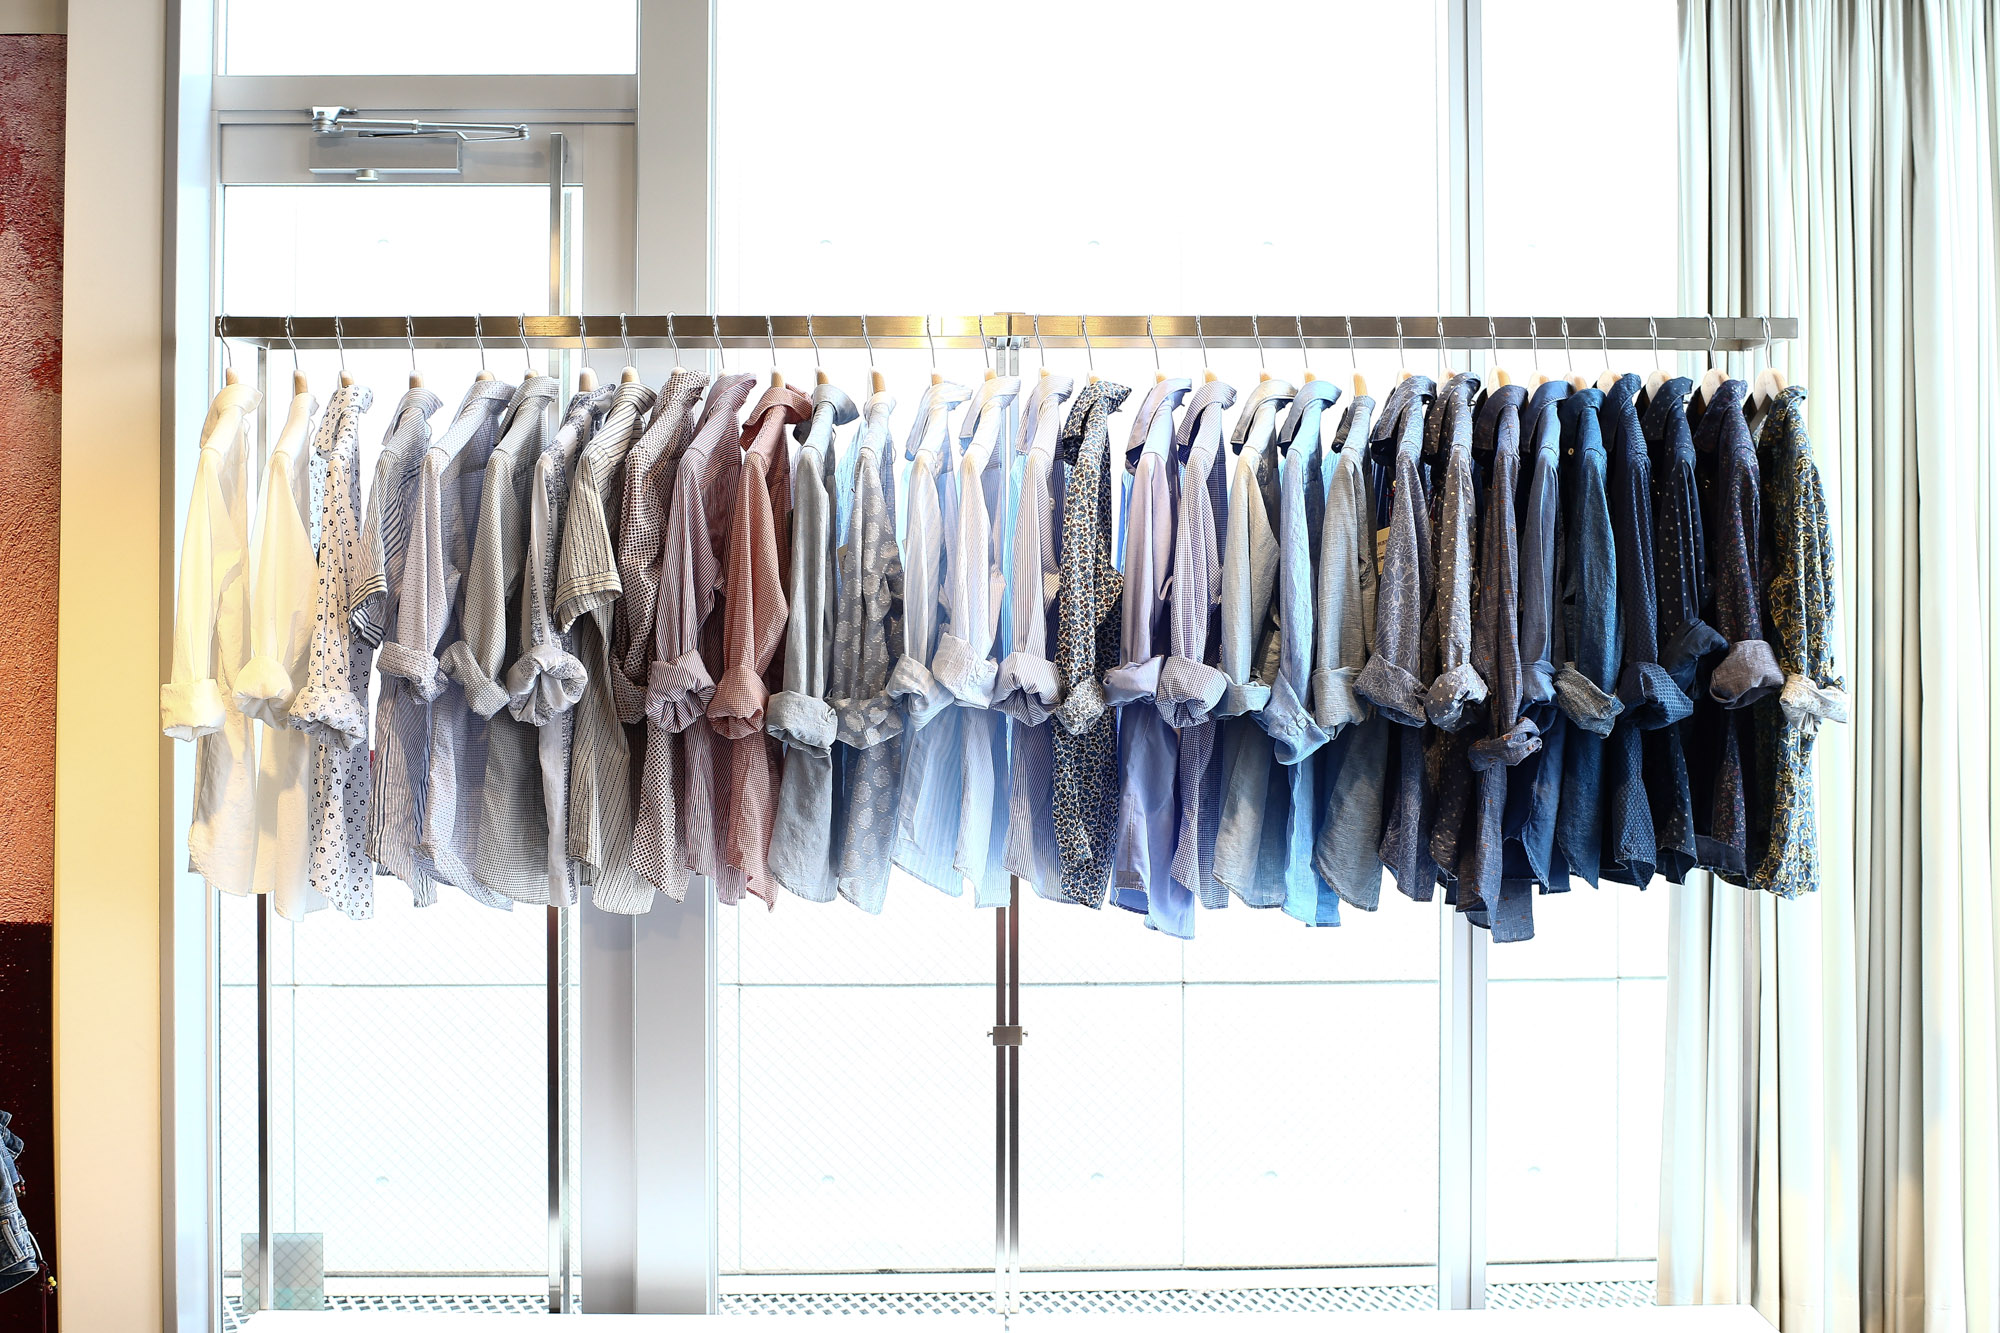 Glanshirt グランシャツ リゾートシャツ イタリシャツ リラックスシャツ  Alto e Diritto 名古屋 取扱い 2017年 春夏 展示会